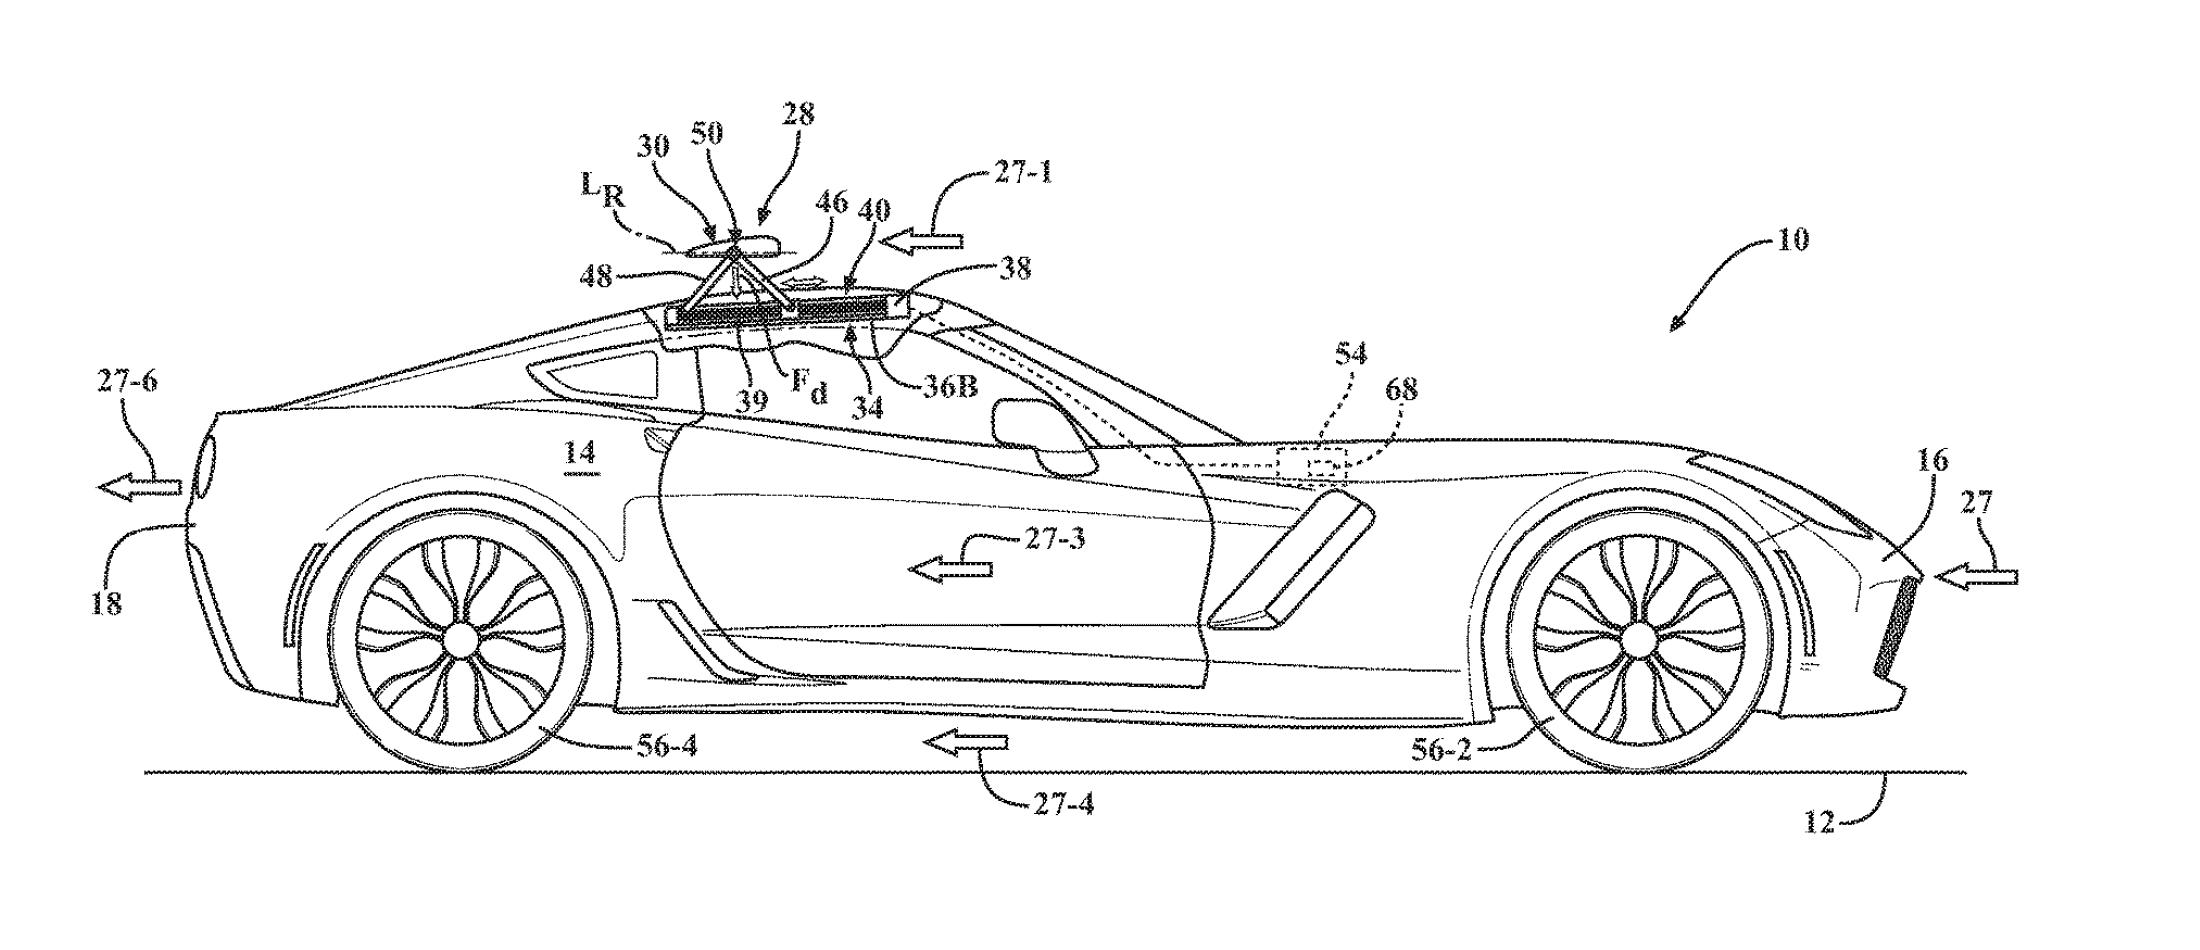 Corvette active aero patent